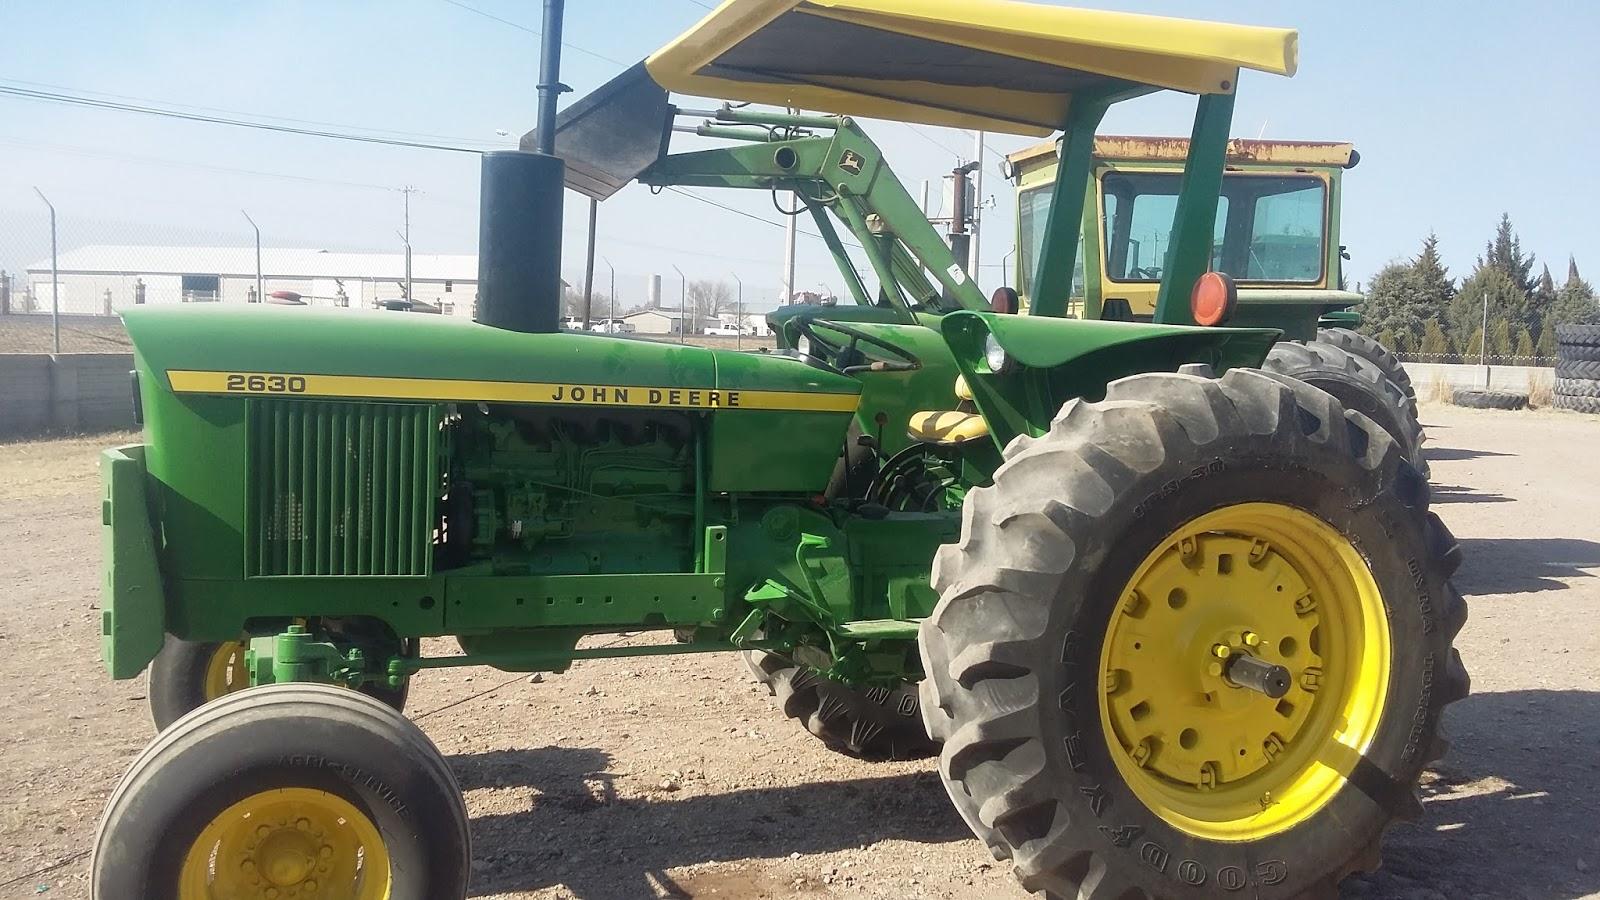 MAQUINARIA AGRICOLA INDUSTRIAL: Tractor John Deere 2630 ...